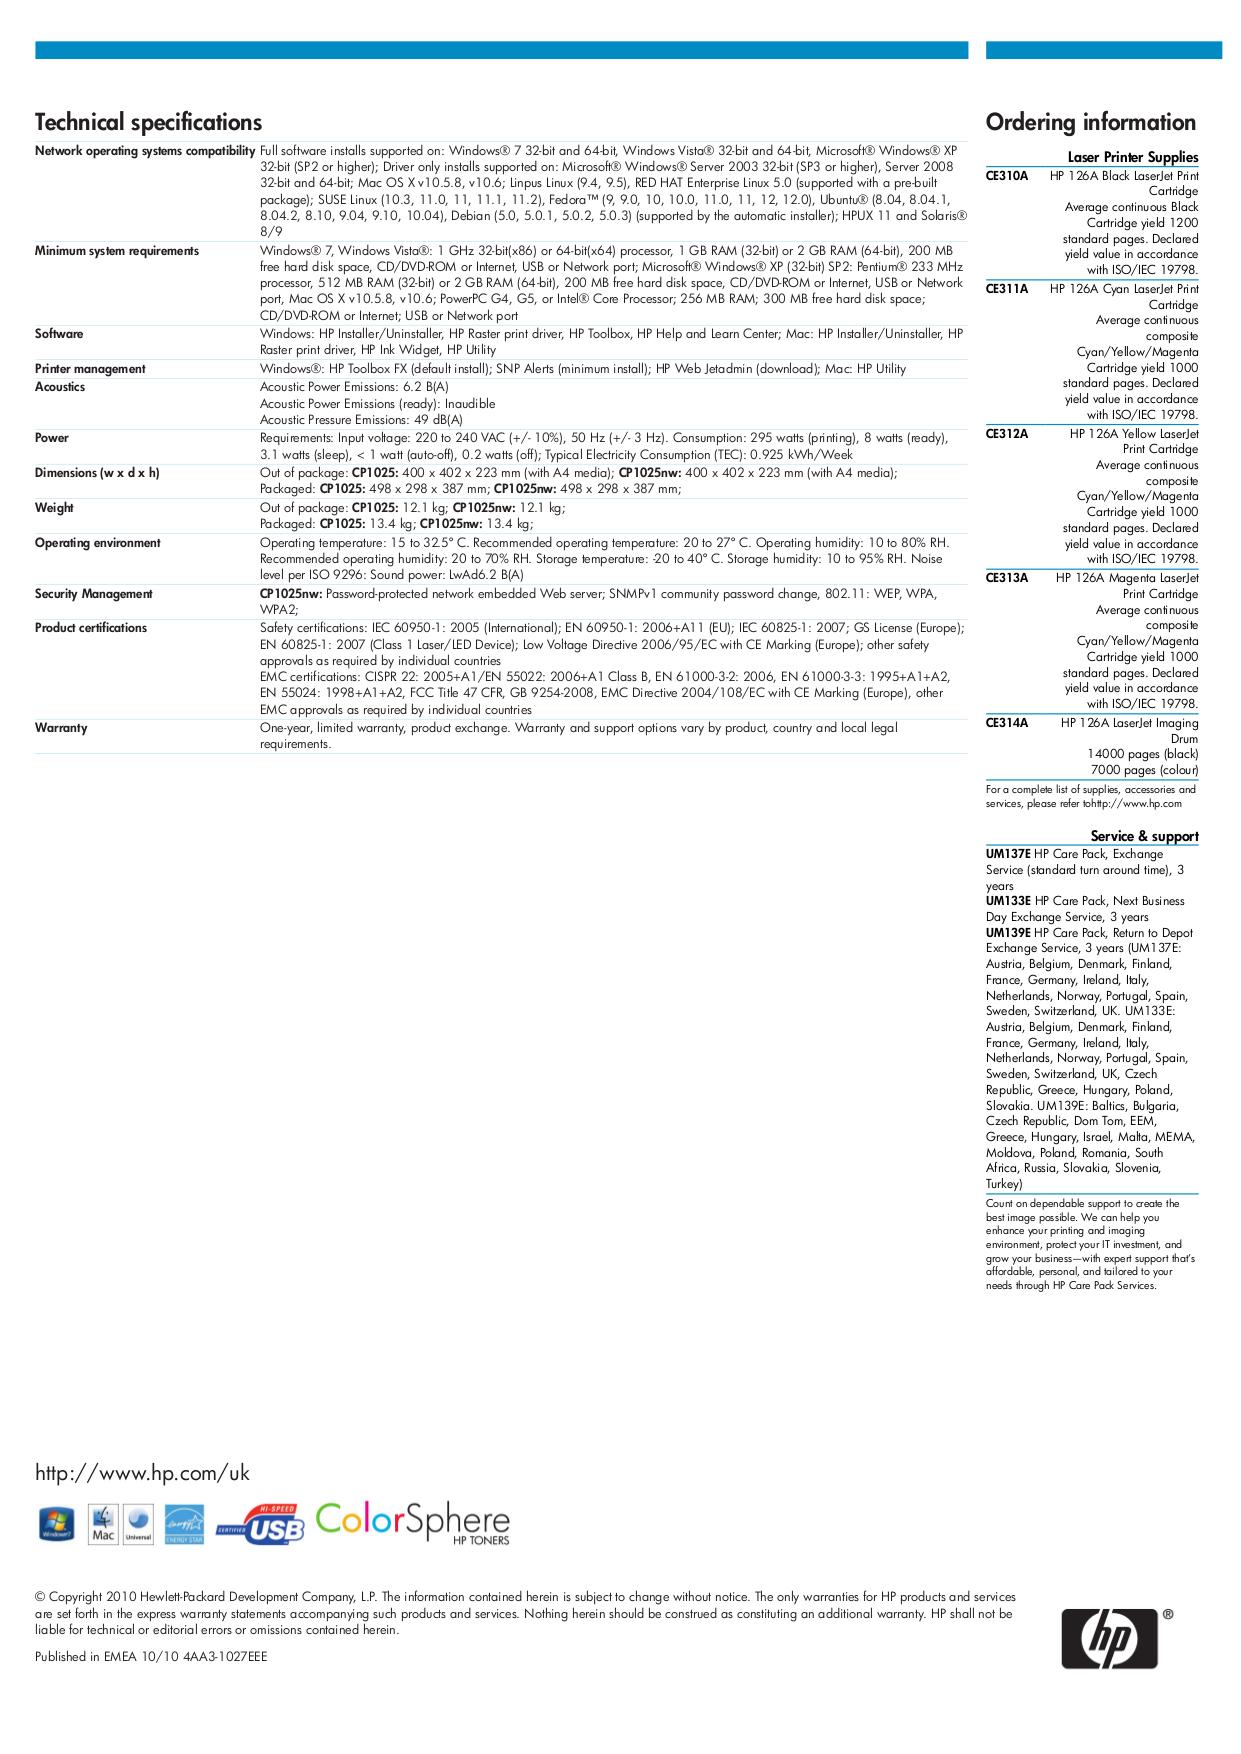 hp laserjet pro p1102 specifications pdf